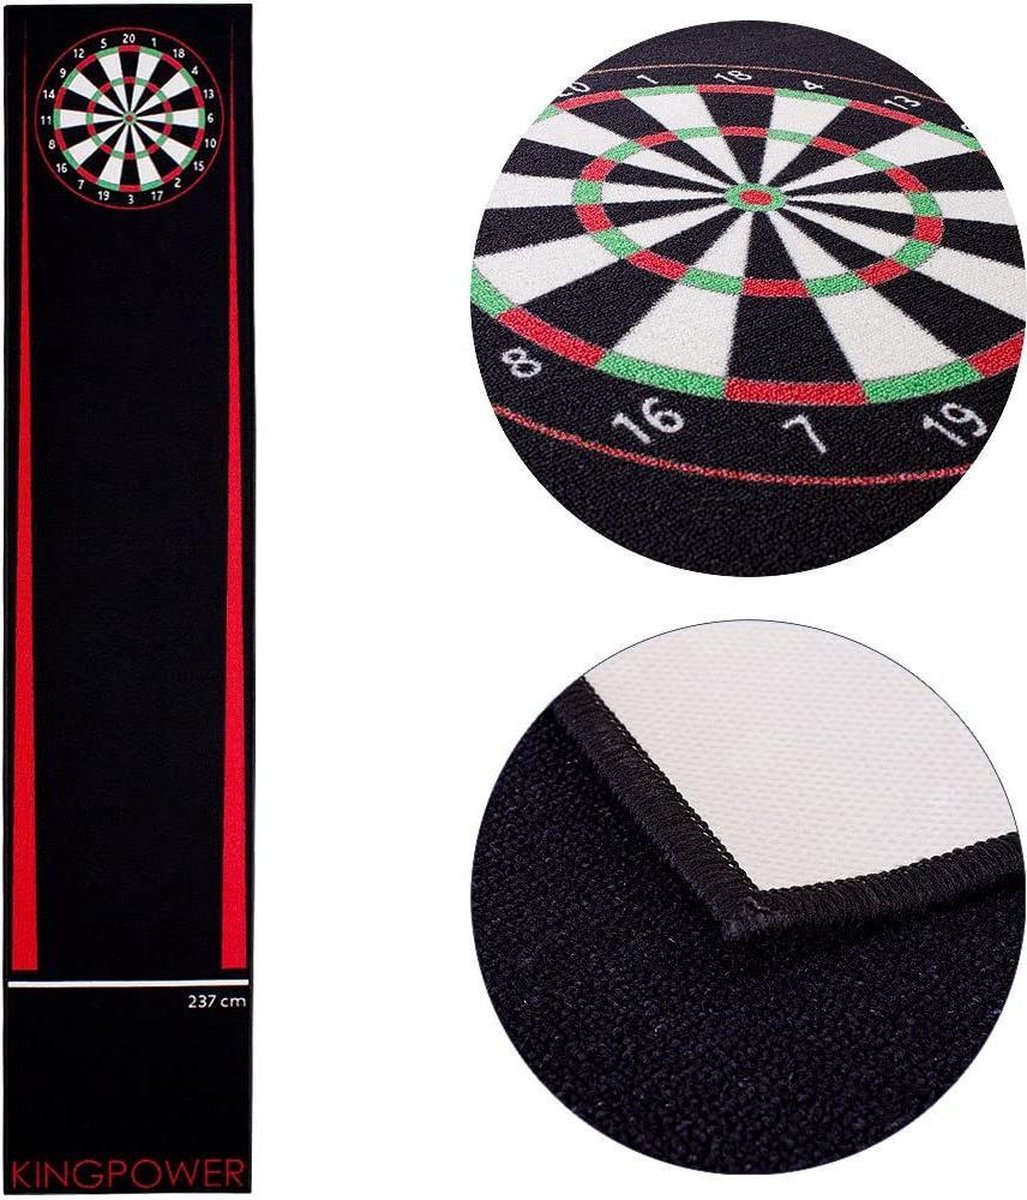 dartmat -Kingpower Dart Mat, Dart Carpet Tournament Mat as Throw Line and Floor Protection in 2 Sizes, 237 cm and 290 cmBrand: Kingpower- (WK 02127)